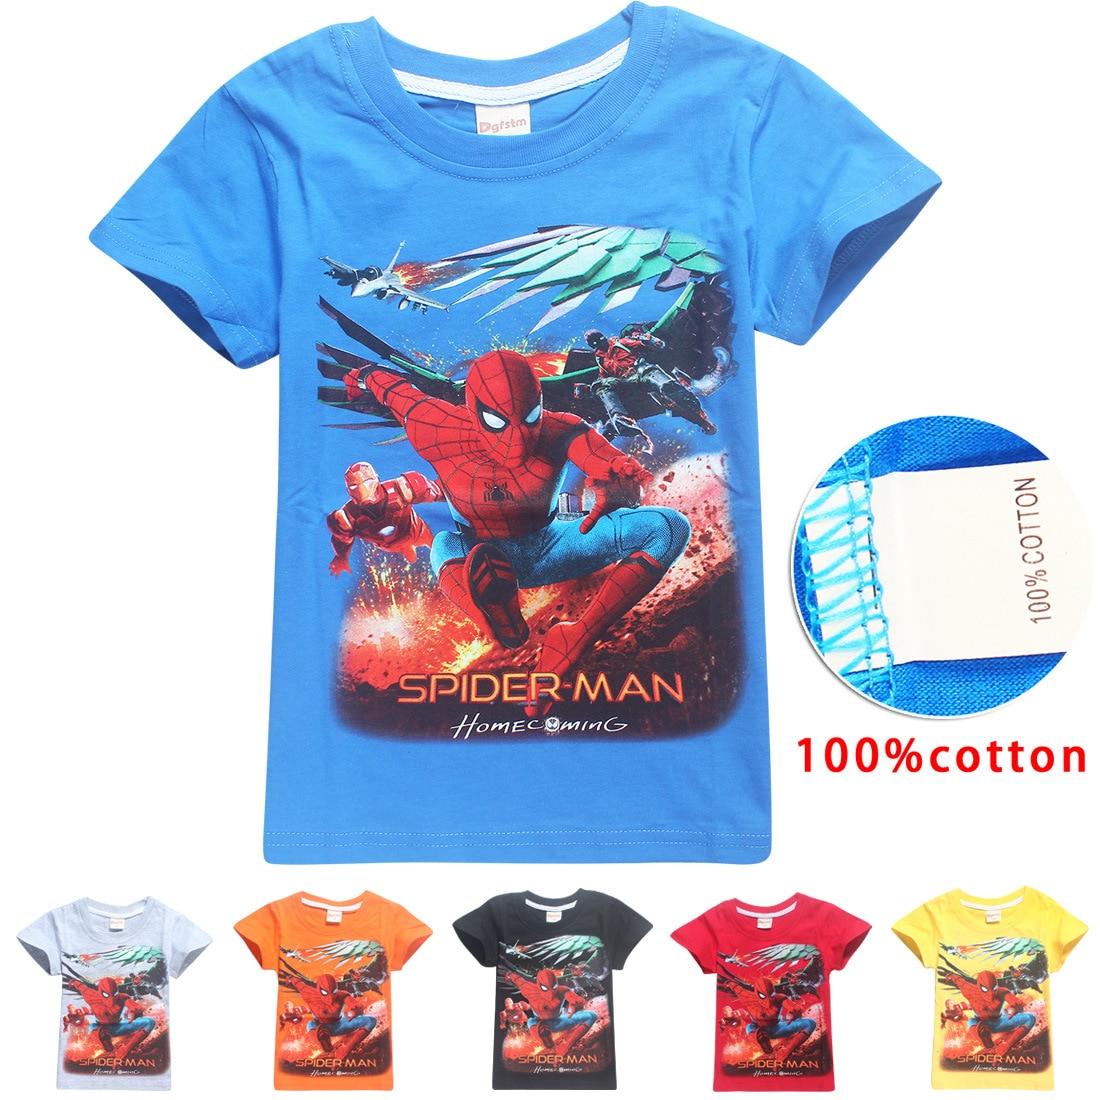 Batman v Superman Movies Printing Boys Clothes Spider-man Short Sleeve t shirt T-Shirts For Boys Kids Baby Children's Clothing